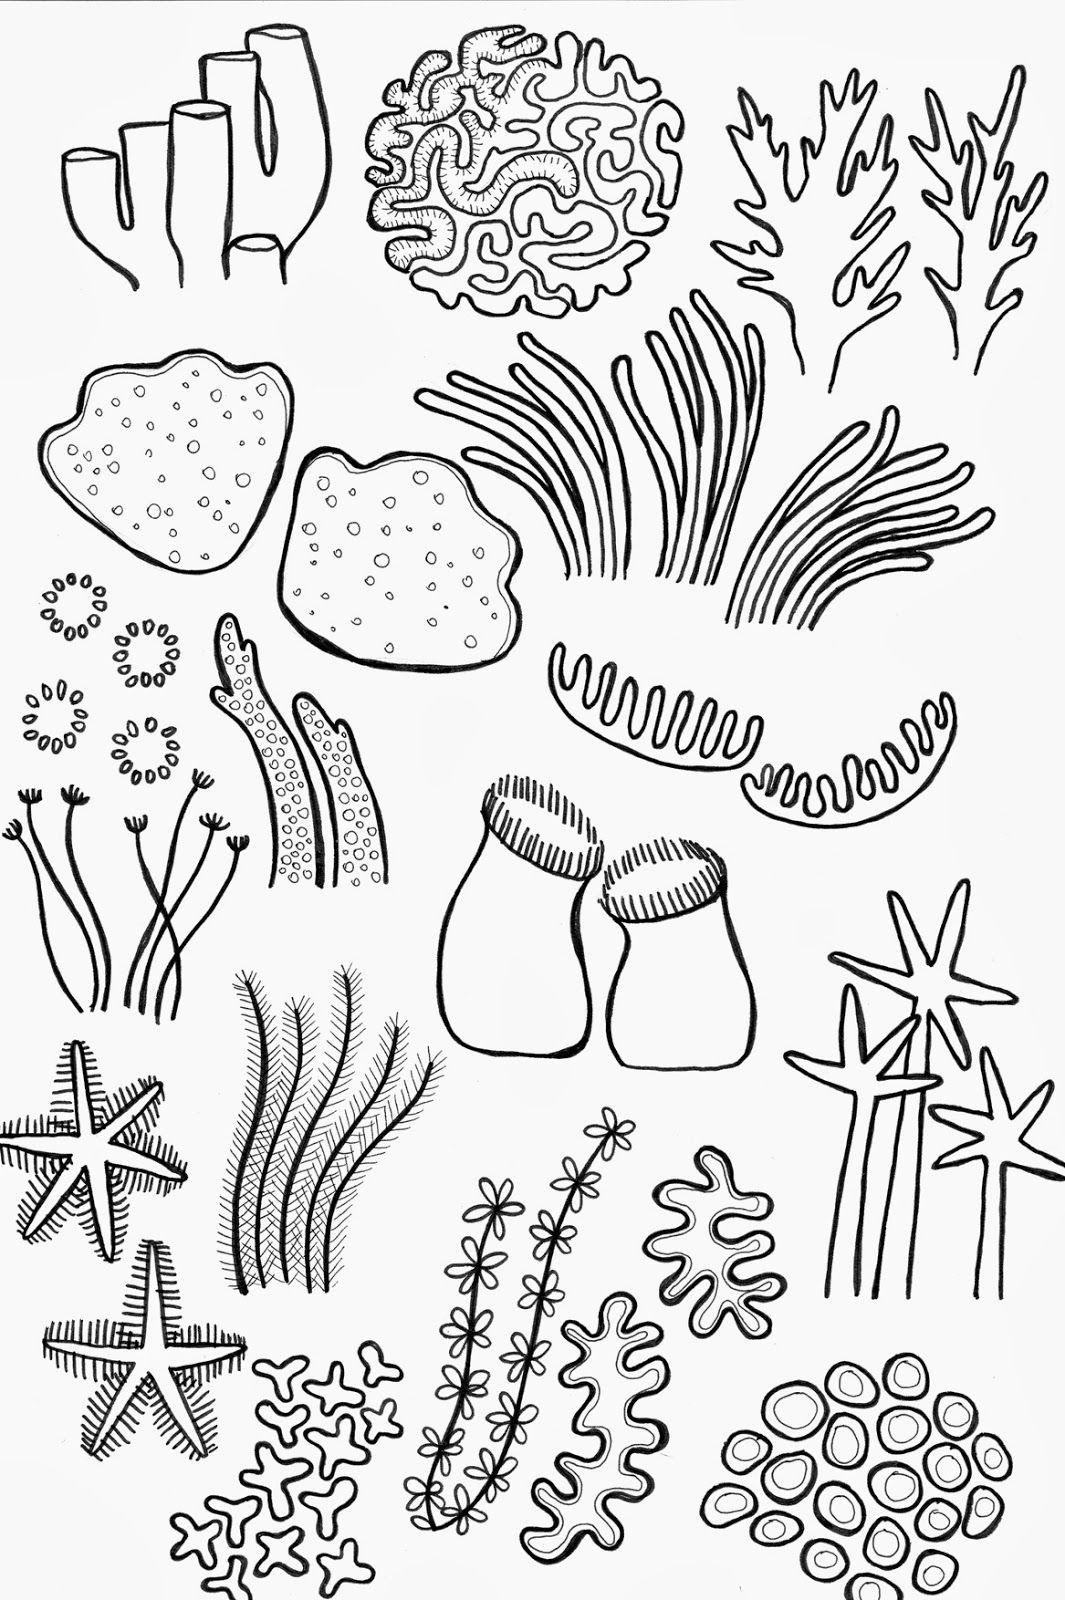 Drawing Underwater Coral Reef Sketch Coloring Page Coral